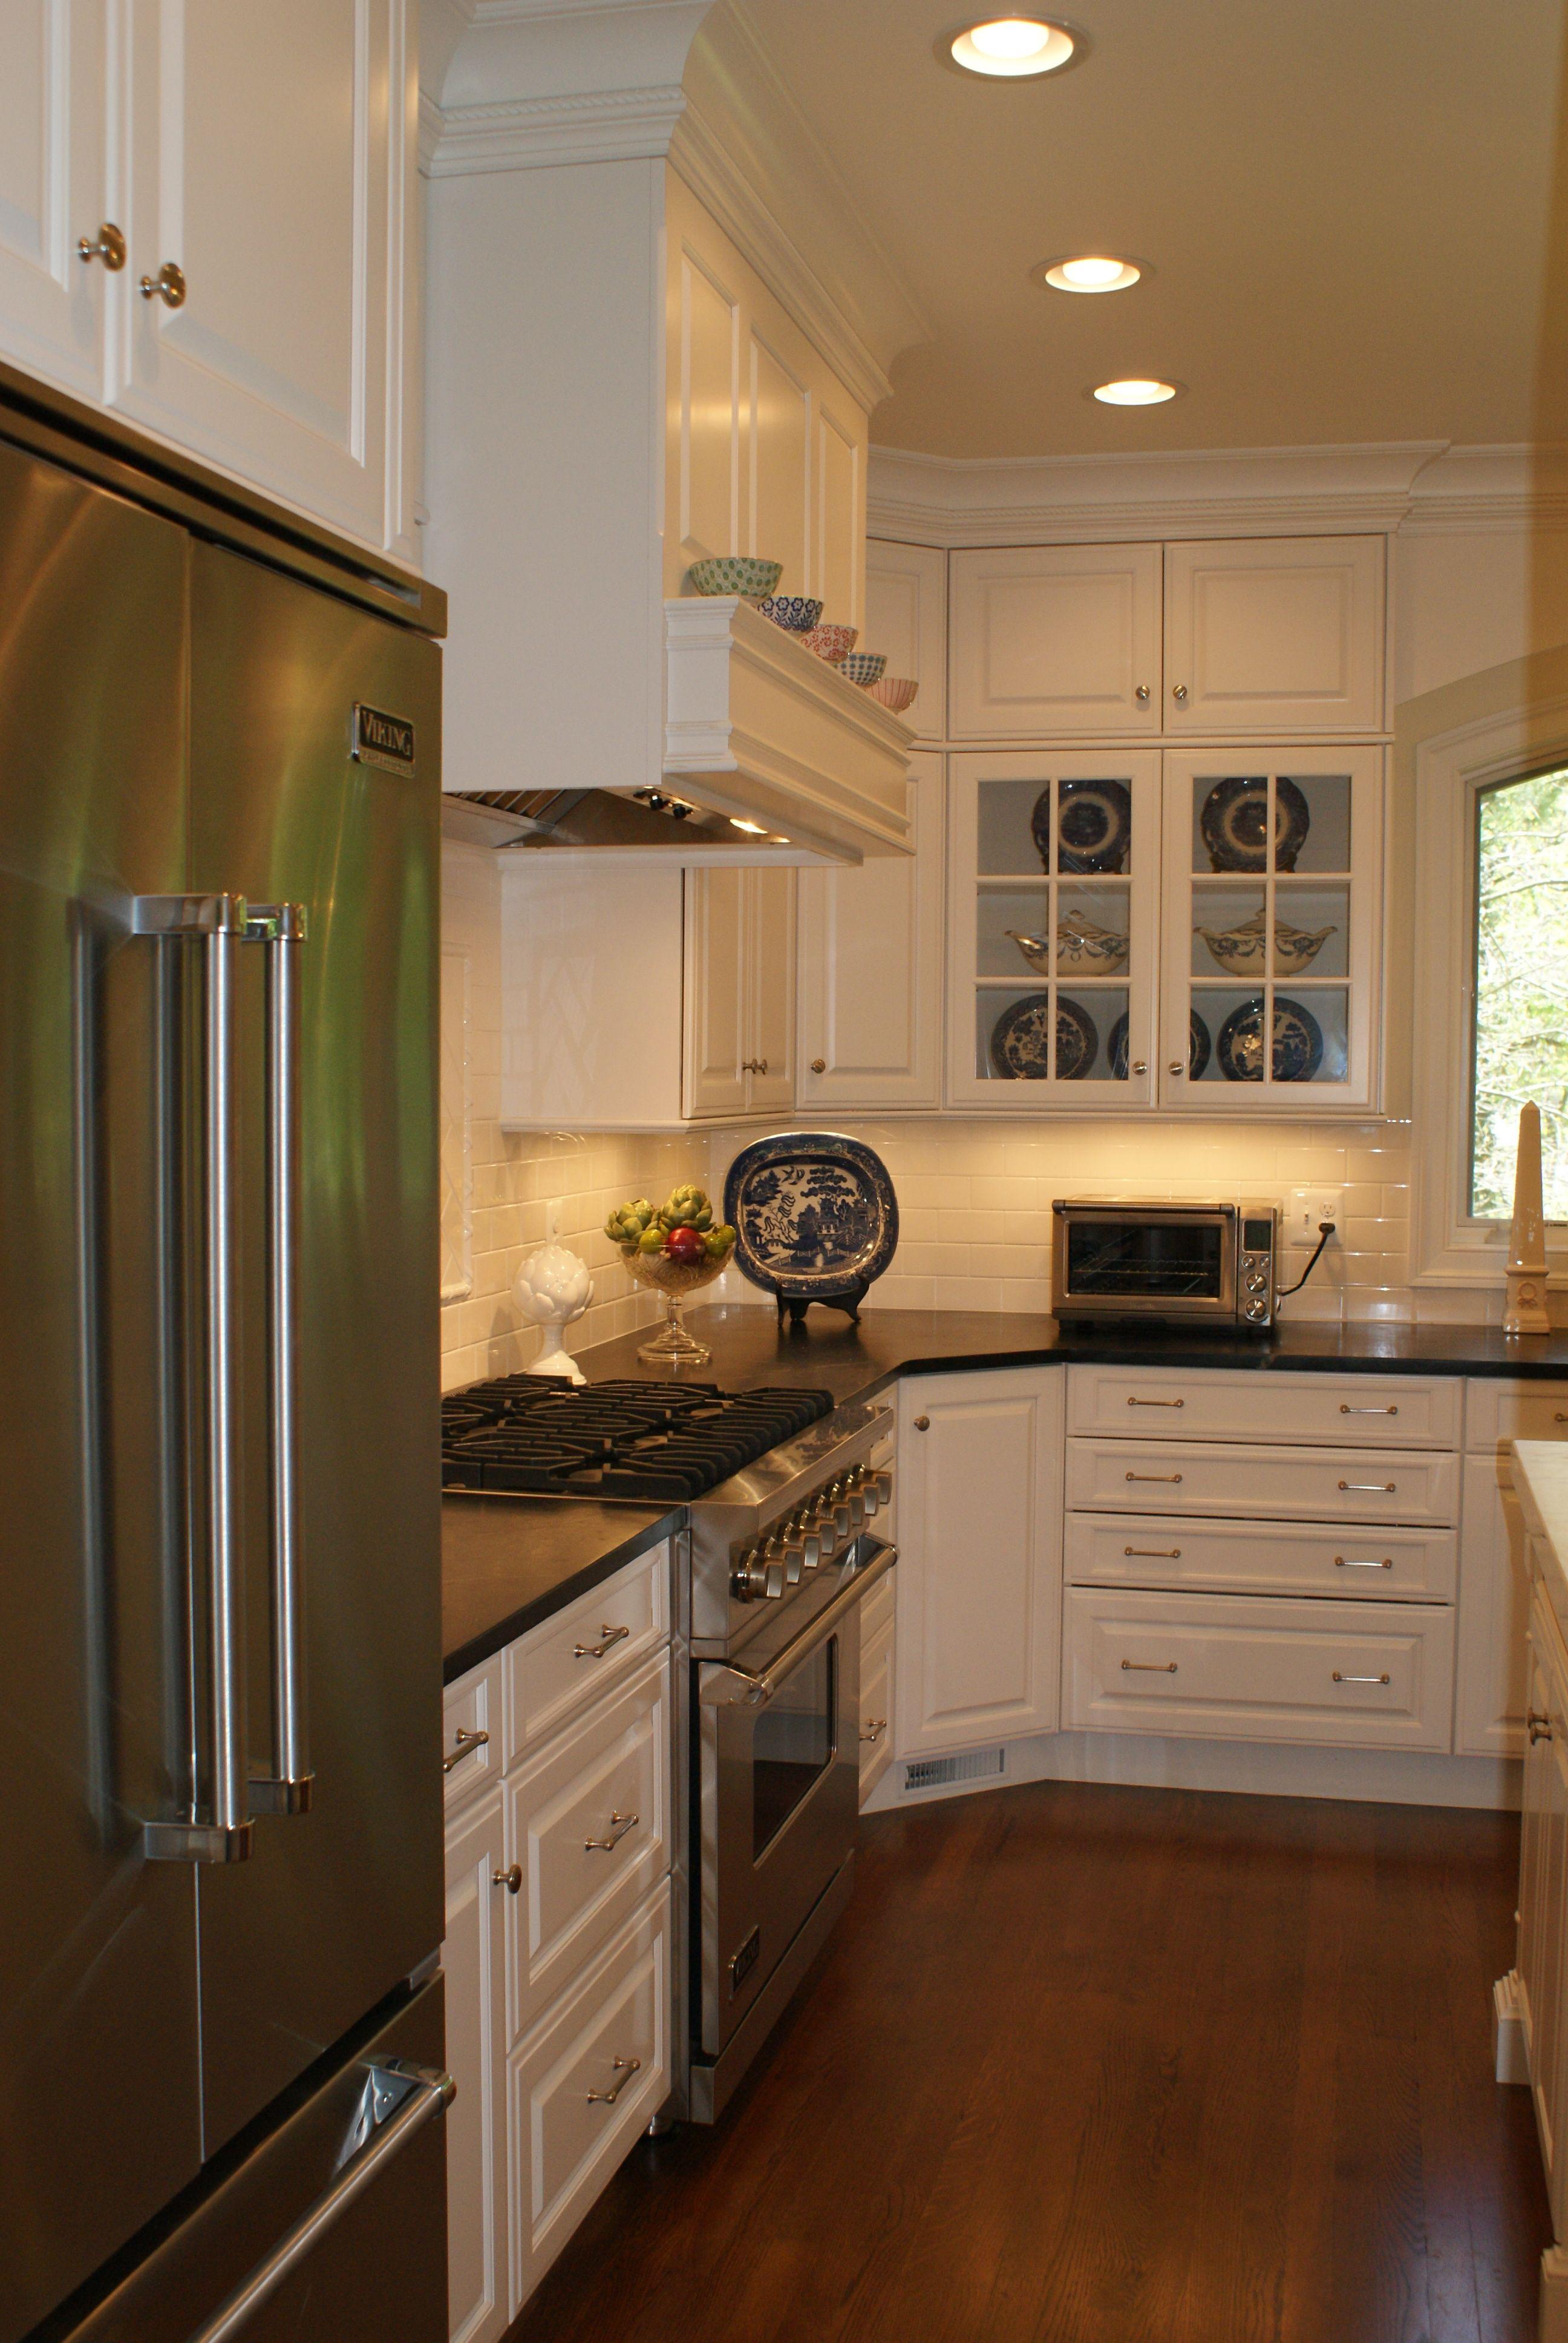 classic kitchen remodel classic kitchens kitchen kitchen remodel on kitchen interior classic id=52143